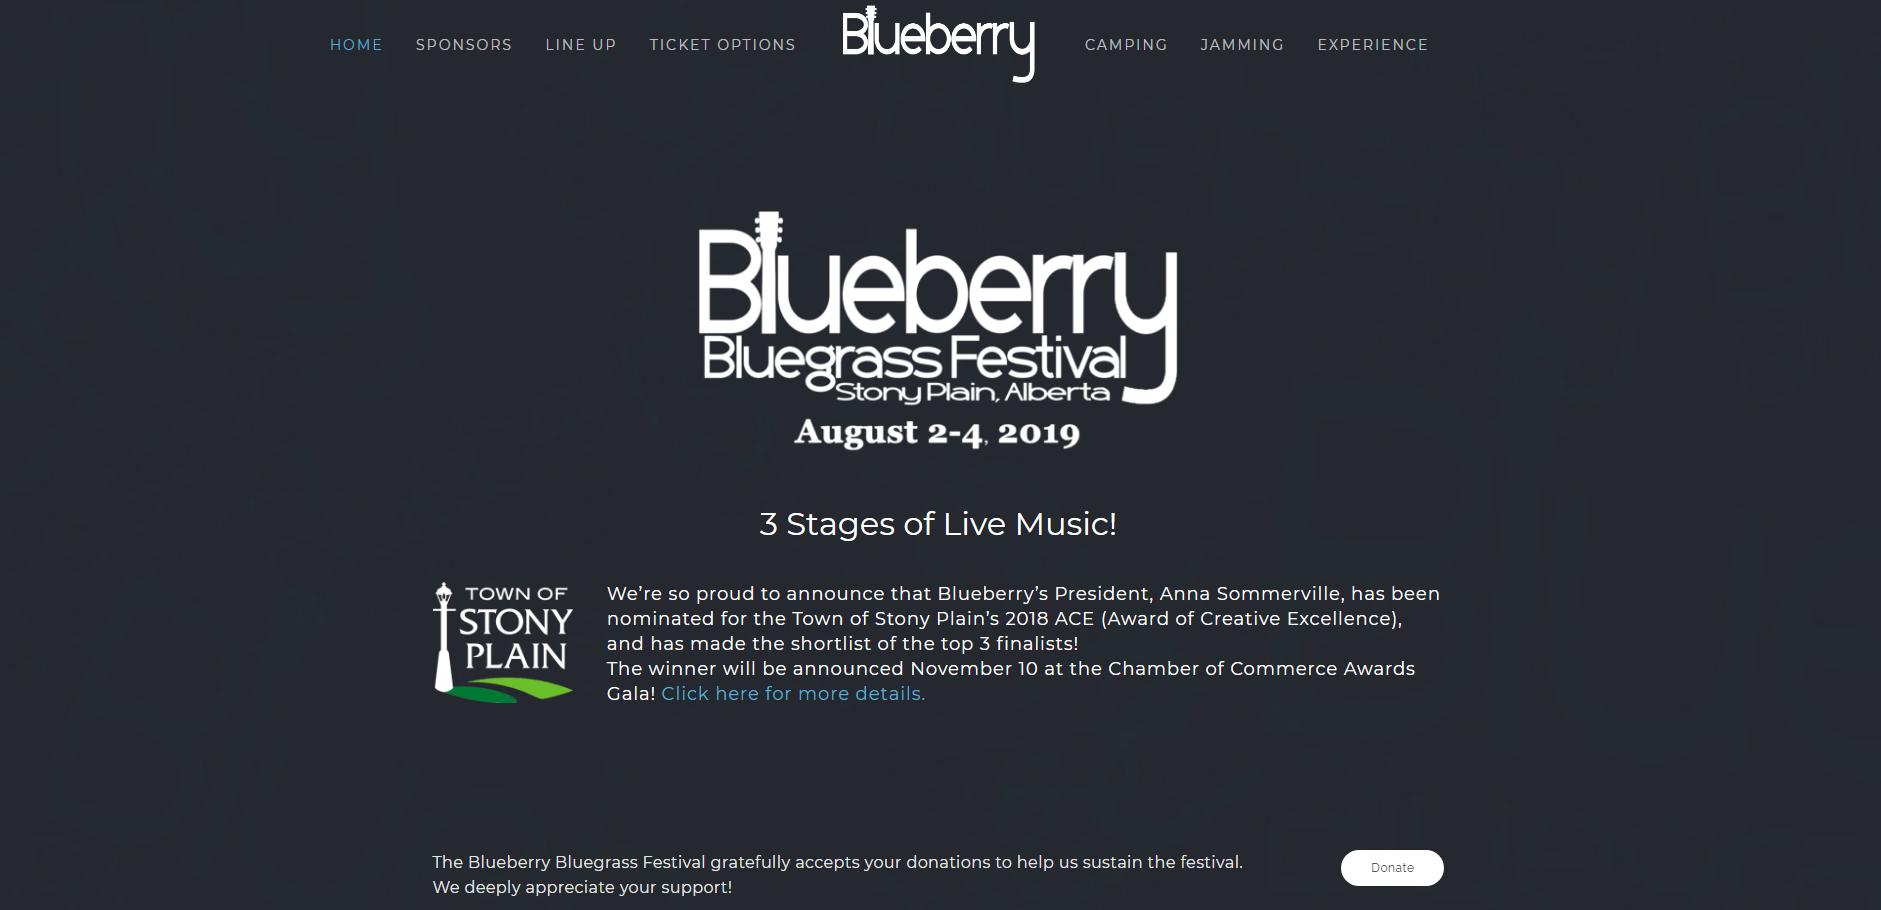 Blueberry Bluegrass Festival